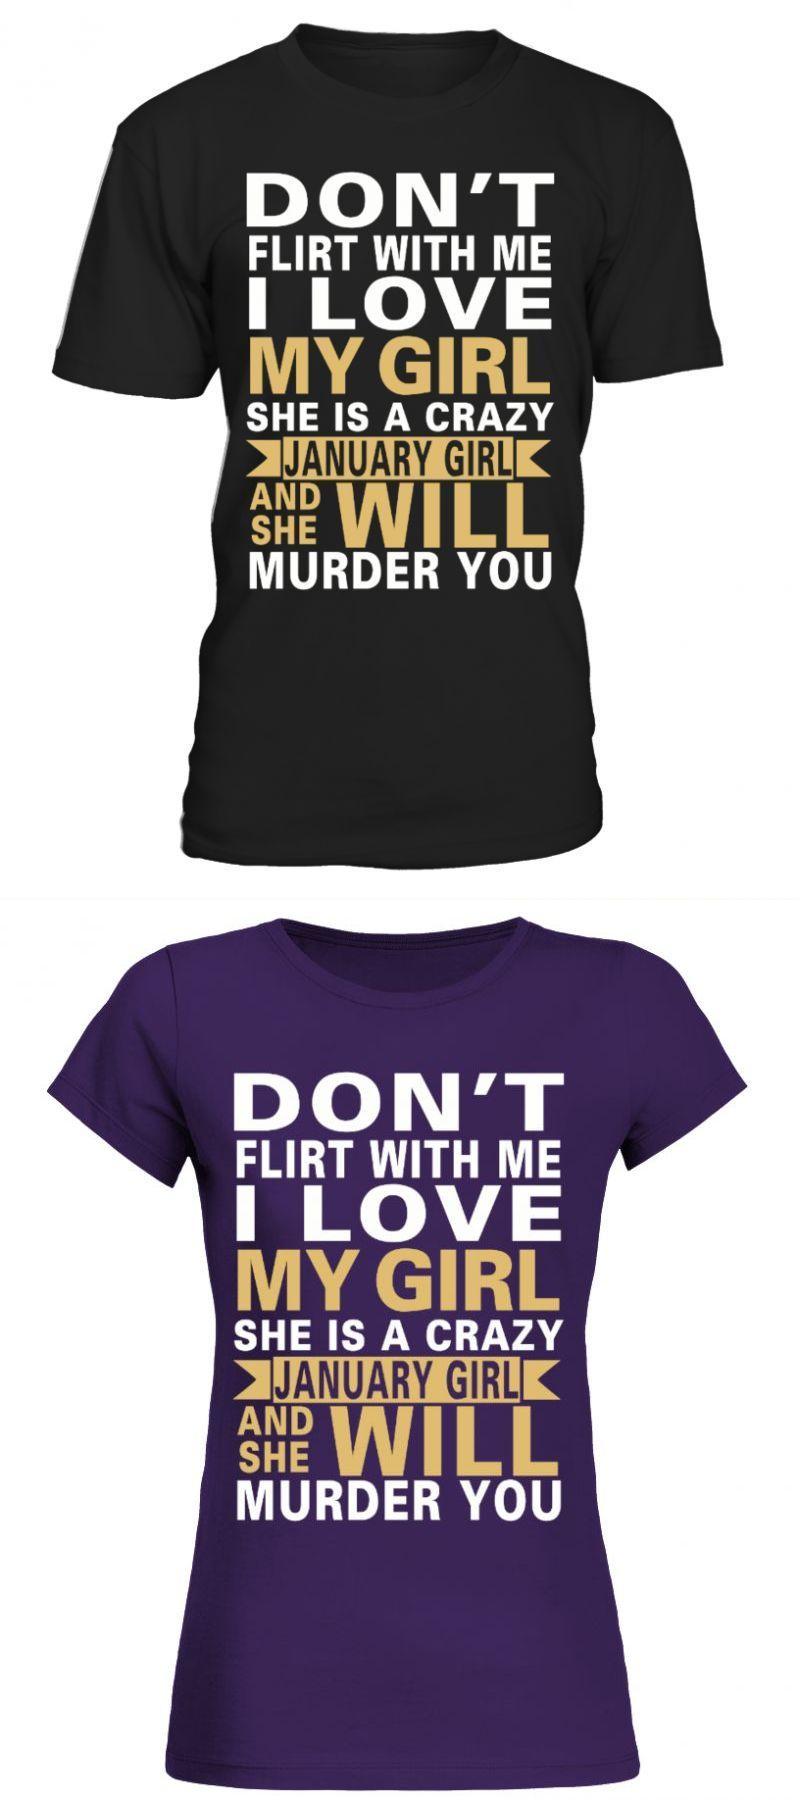 Women's Clothing Tops & Tees Humor Ok Bye Meme Funny Ladies Womens Slogan T Shirt Tee Tshirt Gift Tops S-3xl Dropshipping